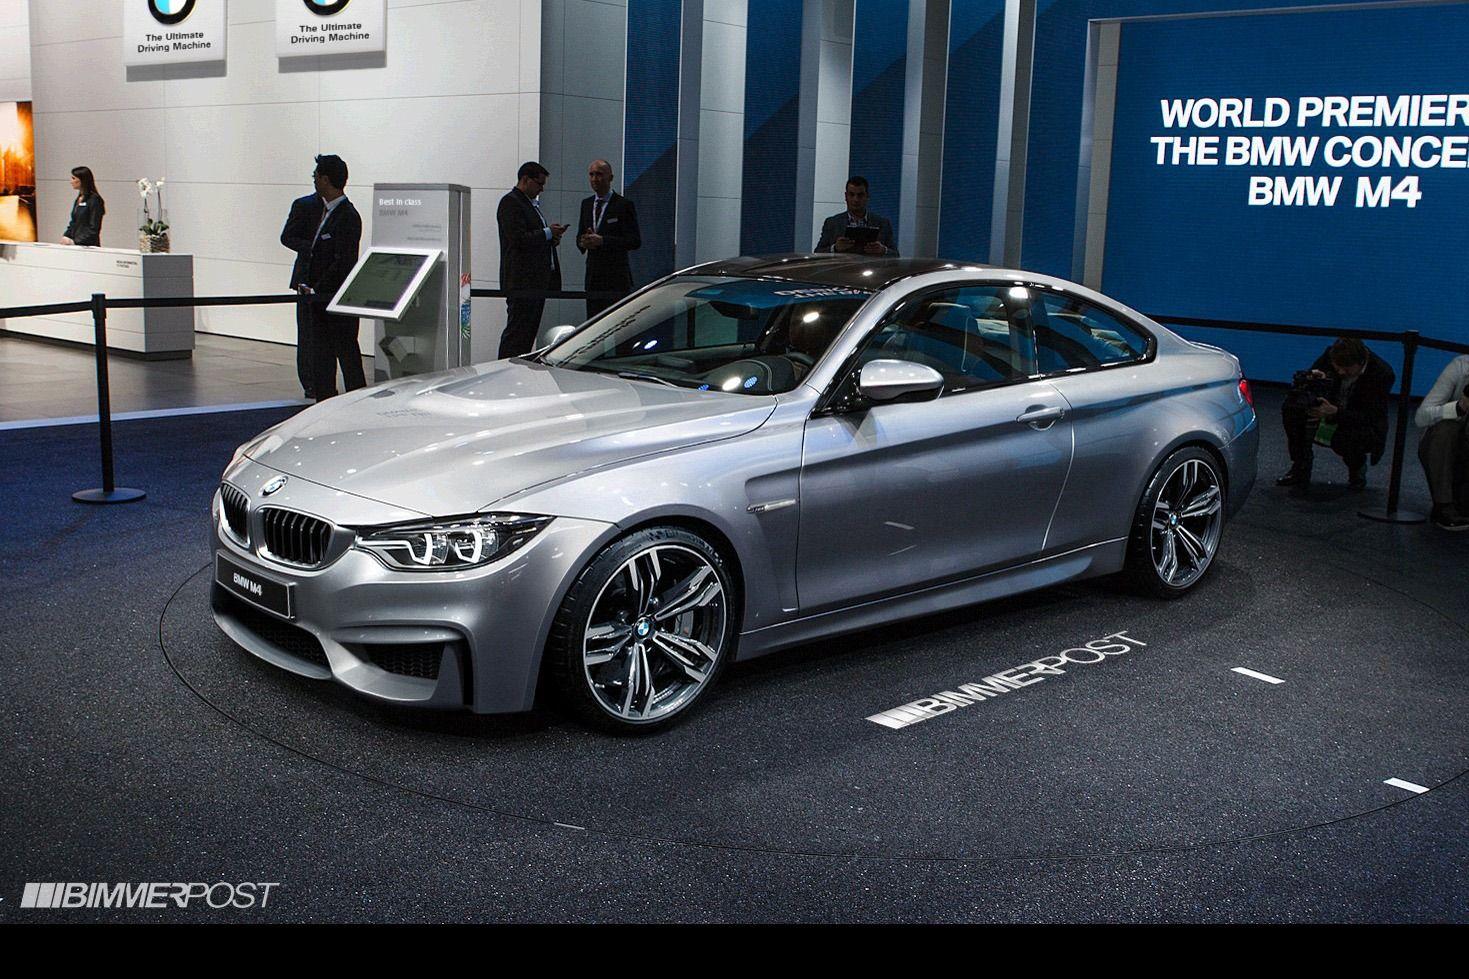 BMW MM ConceptRender BMW Pinterest BMW M BMW - 2014 bmw m3